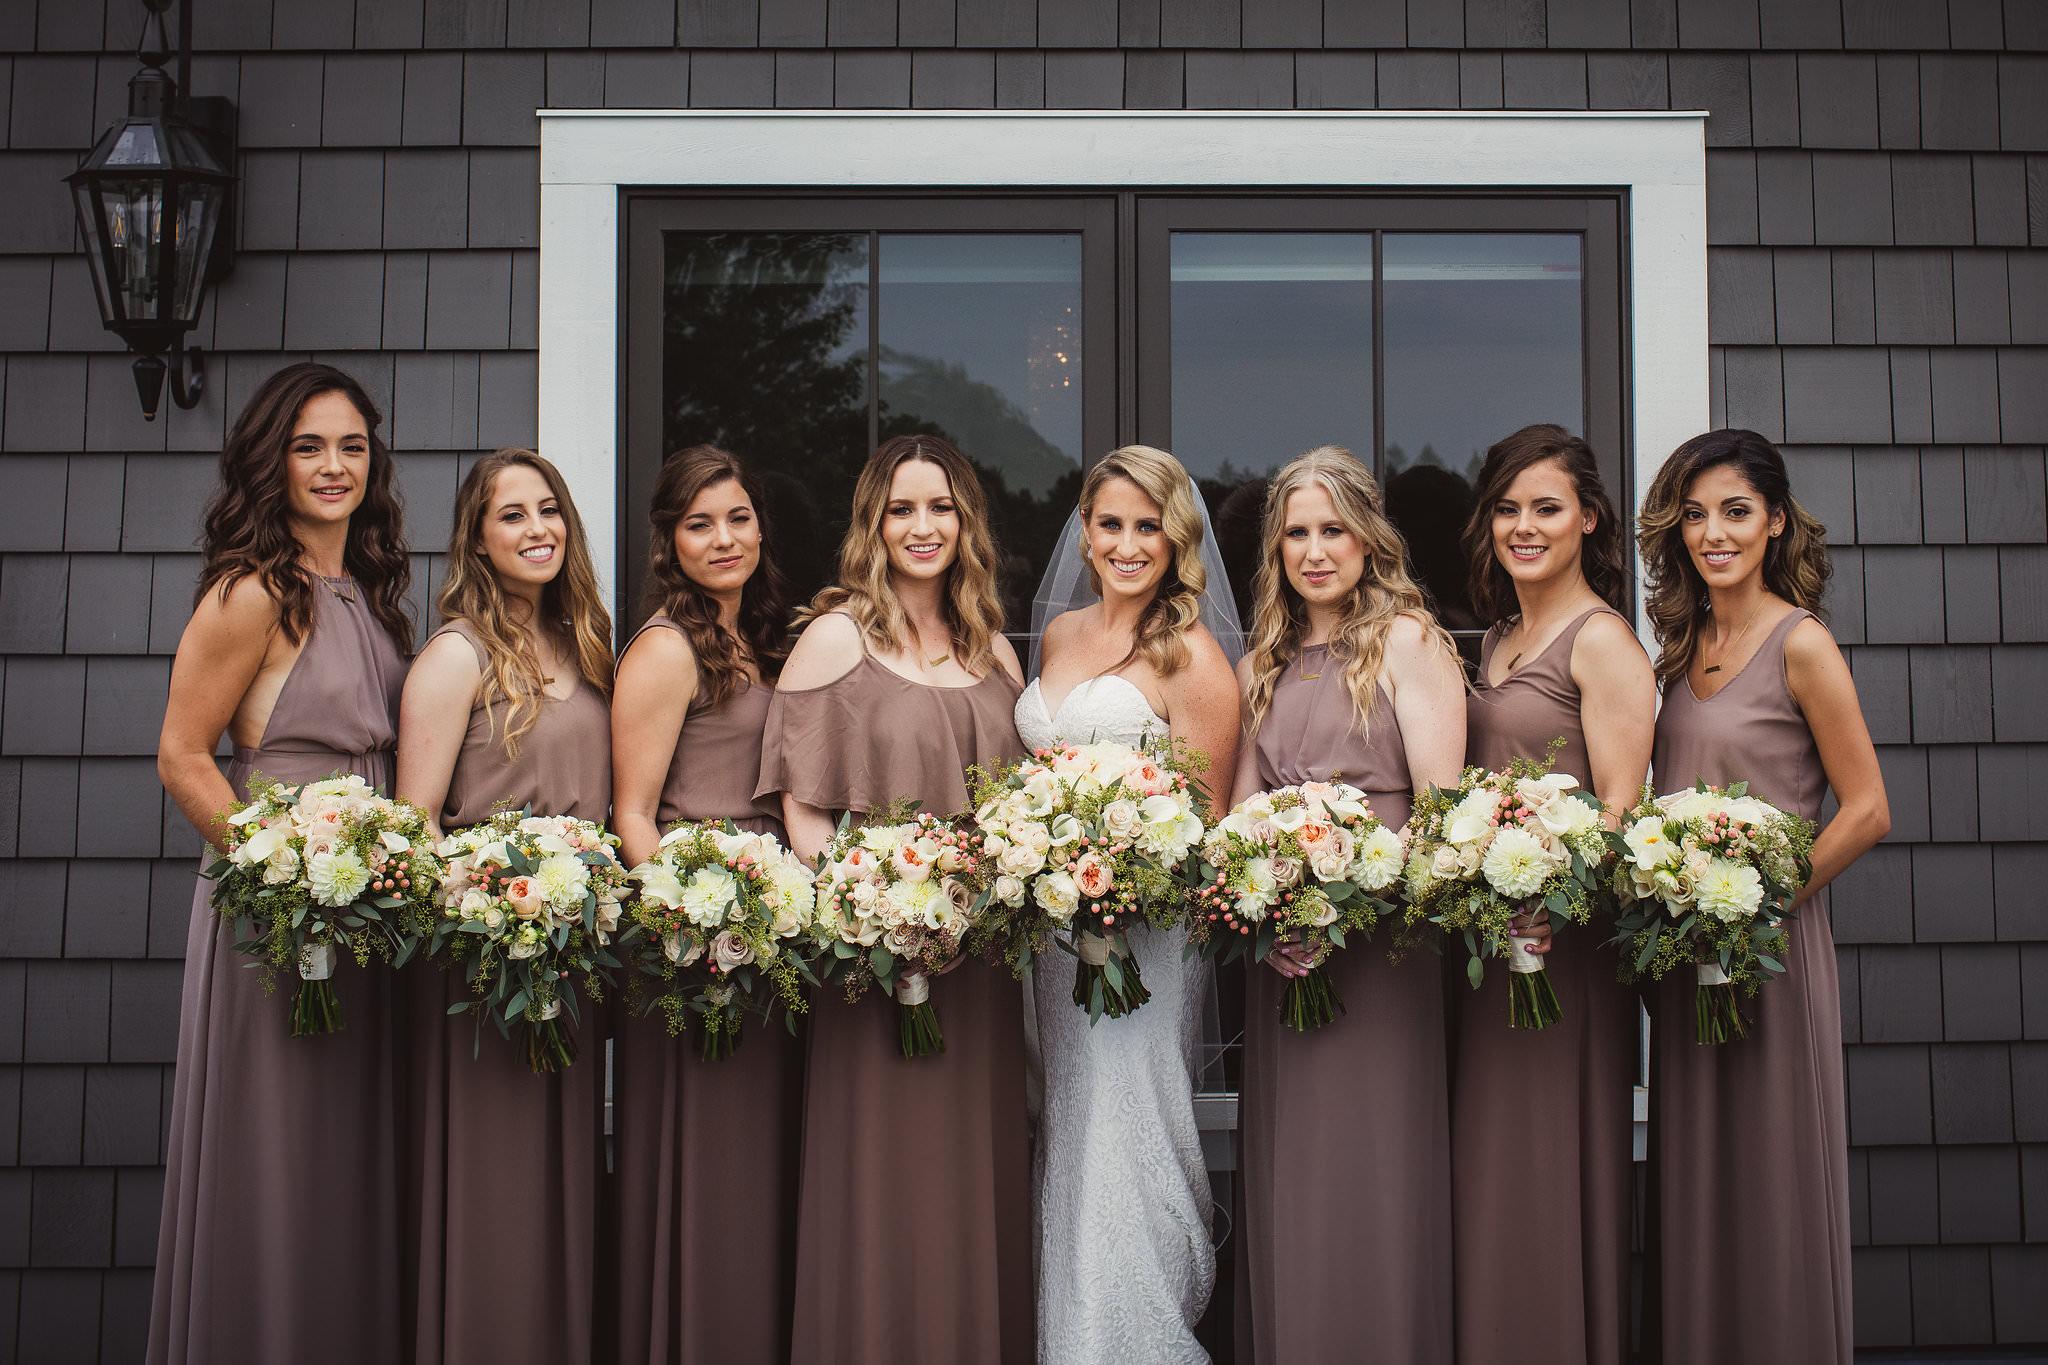 bride and bridesmaid photos at whistlebear on terrace